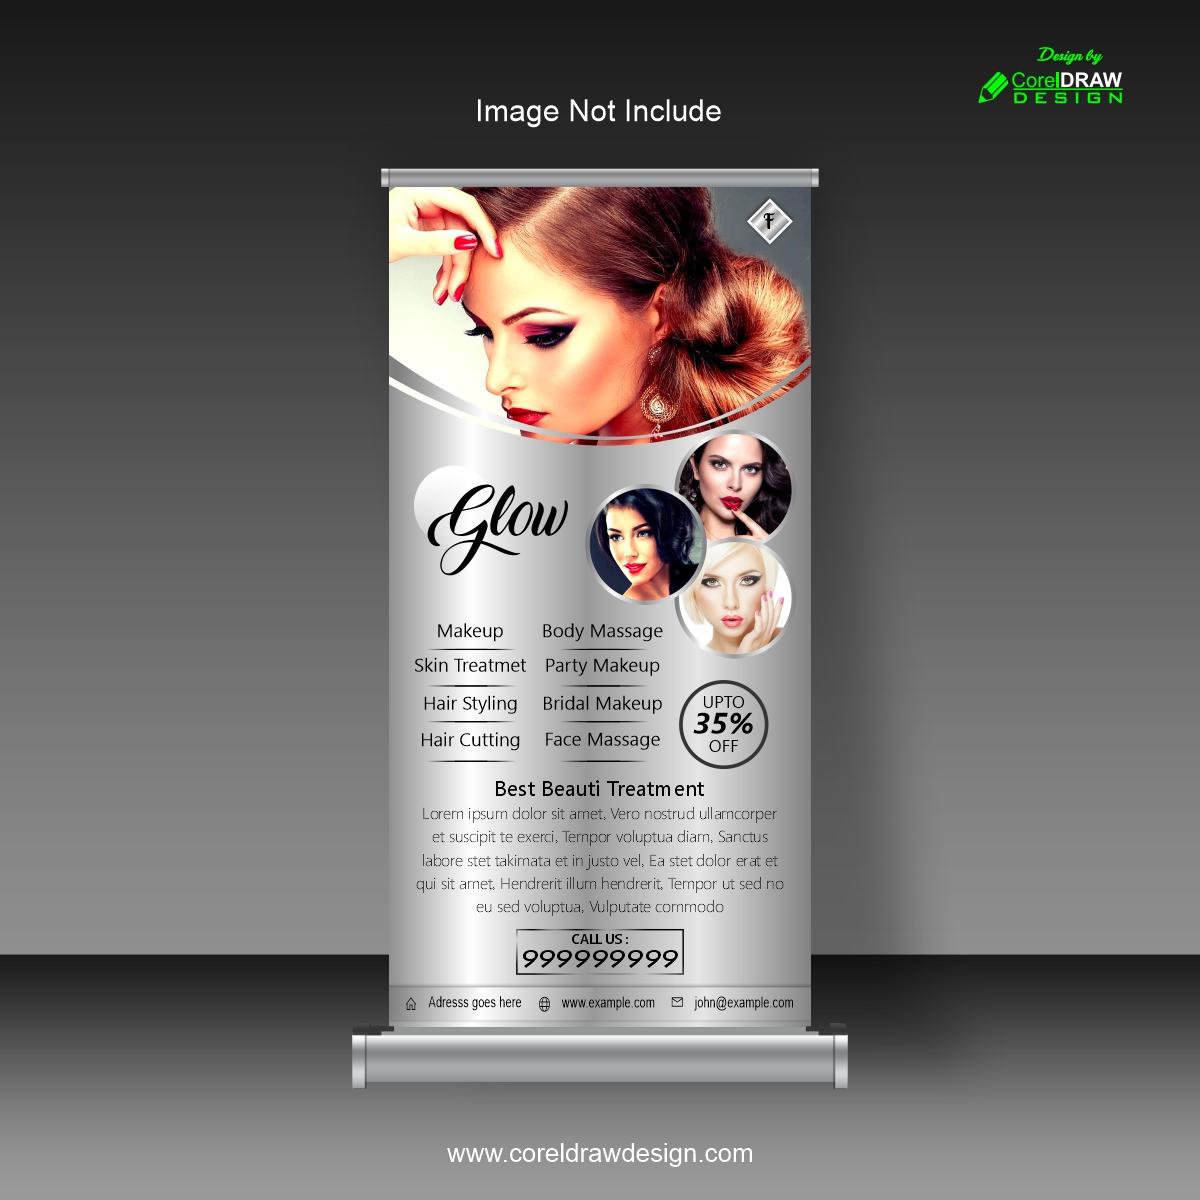 Download Roll Up Banner Glow Beauty Salon Design Coreldraw Design Download Free Cdr Vector Stock Images Tutorials Tips Tricks